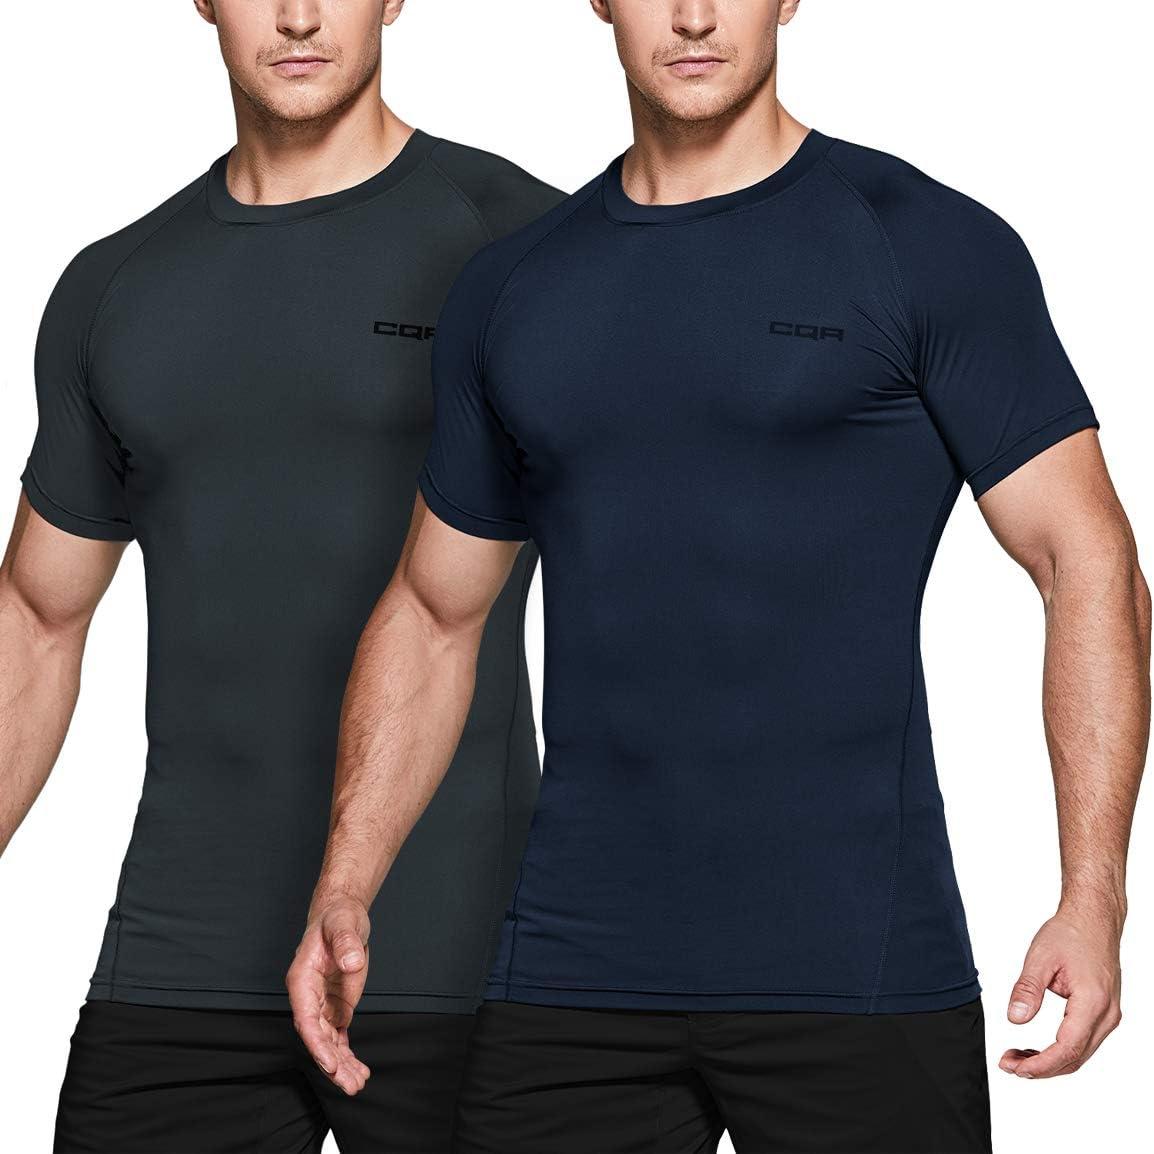 Mens Compression Short Sleeve Base Layer Tight Tops Gym Sports T-Shirt Basic HOT